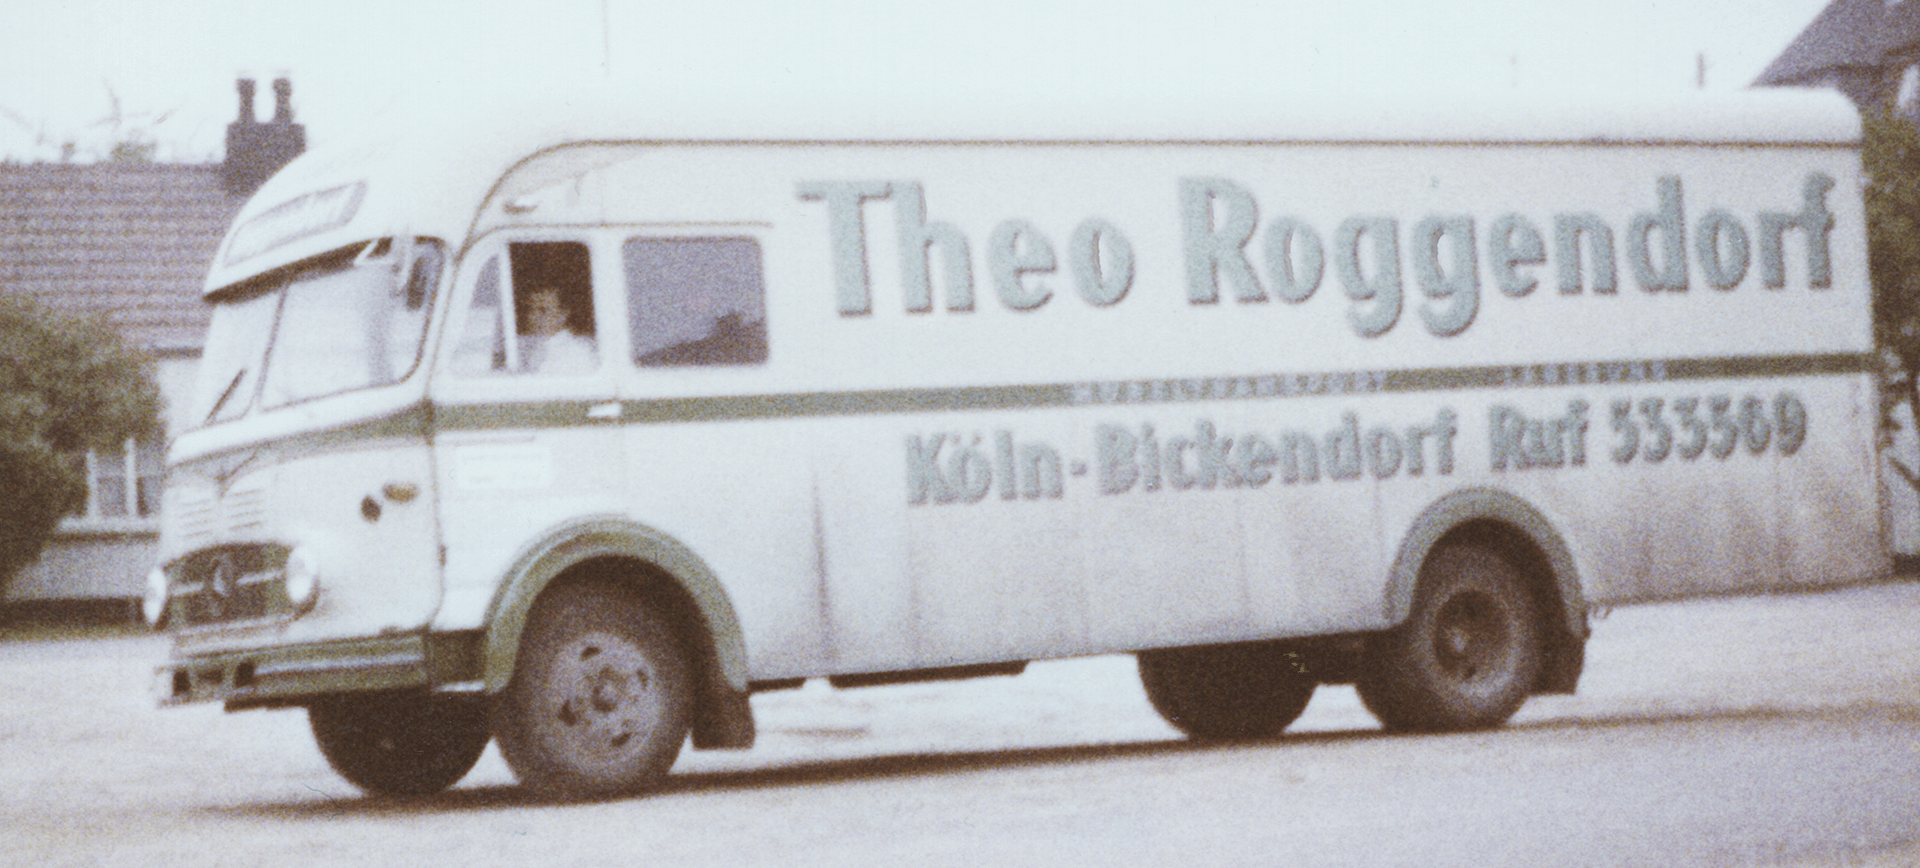 roggendorf umzug service ueber uns historie